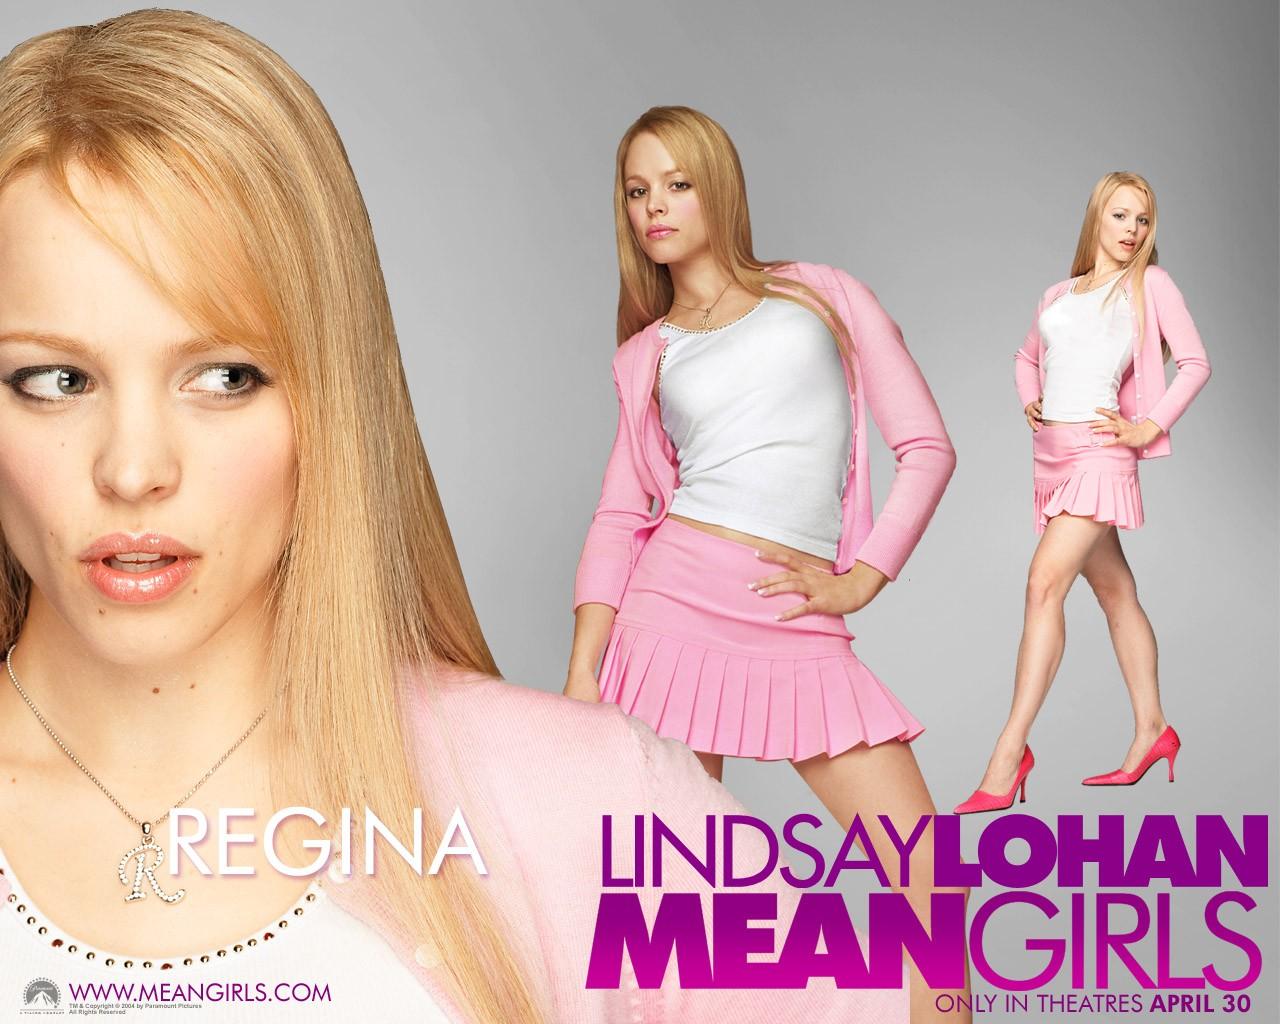 Un wallpaper di Rachel McAdams (Regina) per il film Mean Girls